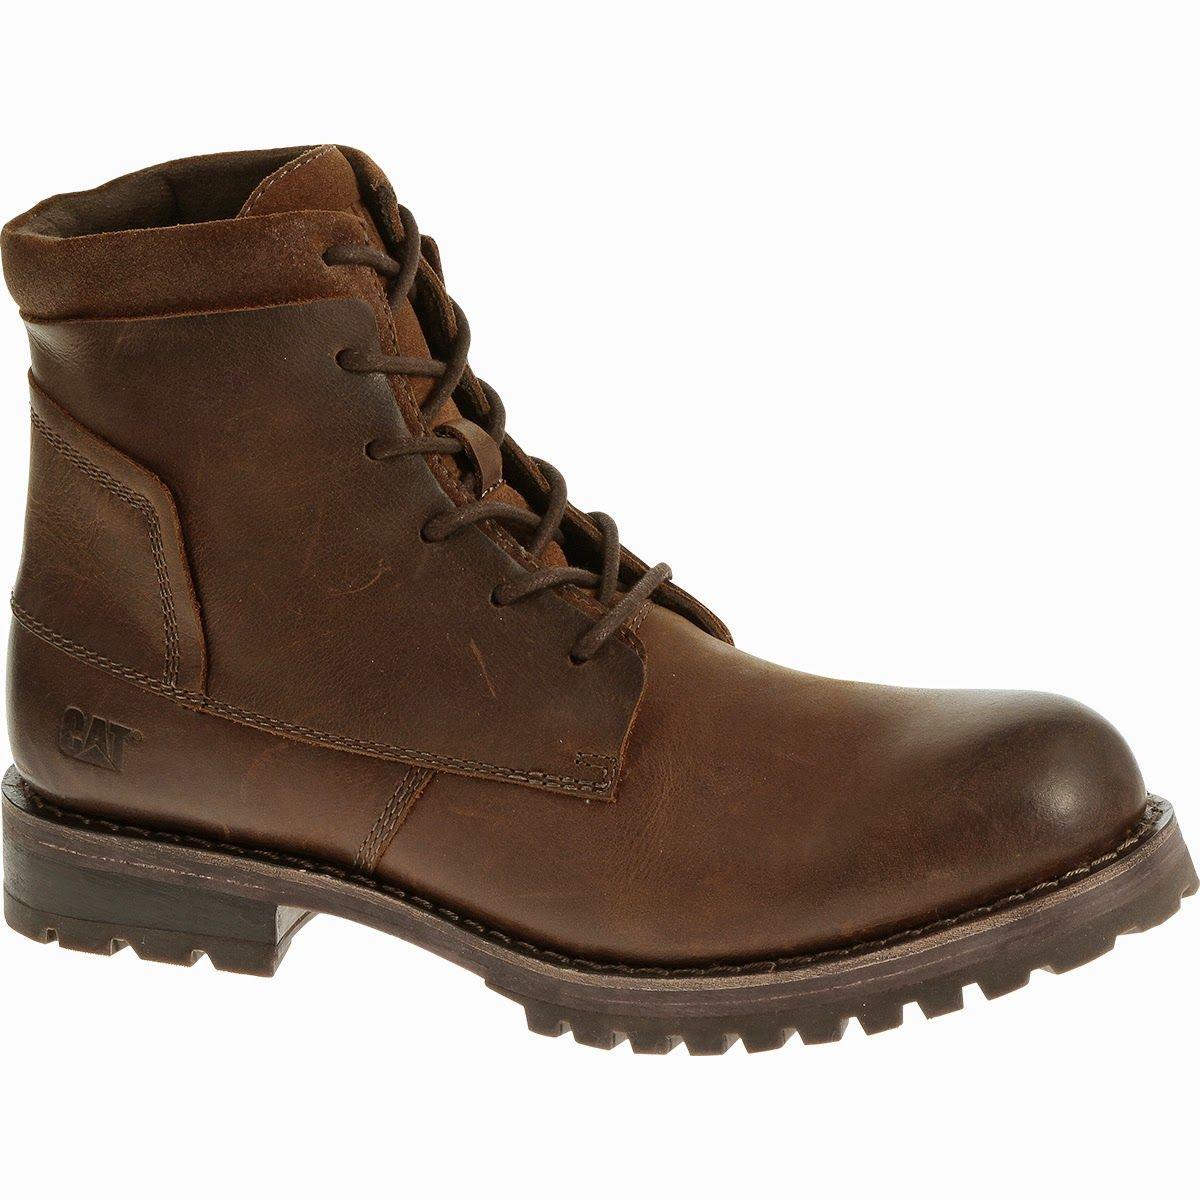 caterpillar shoes vero cuoio men s half boots